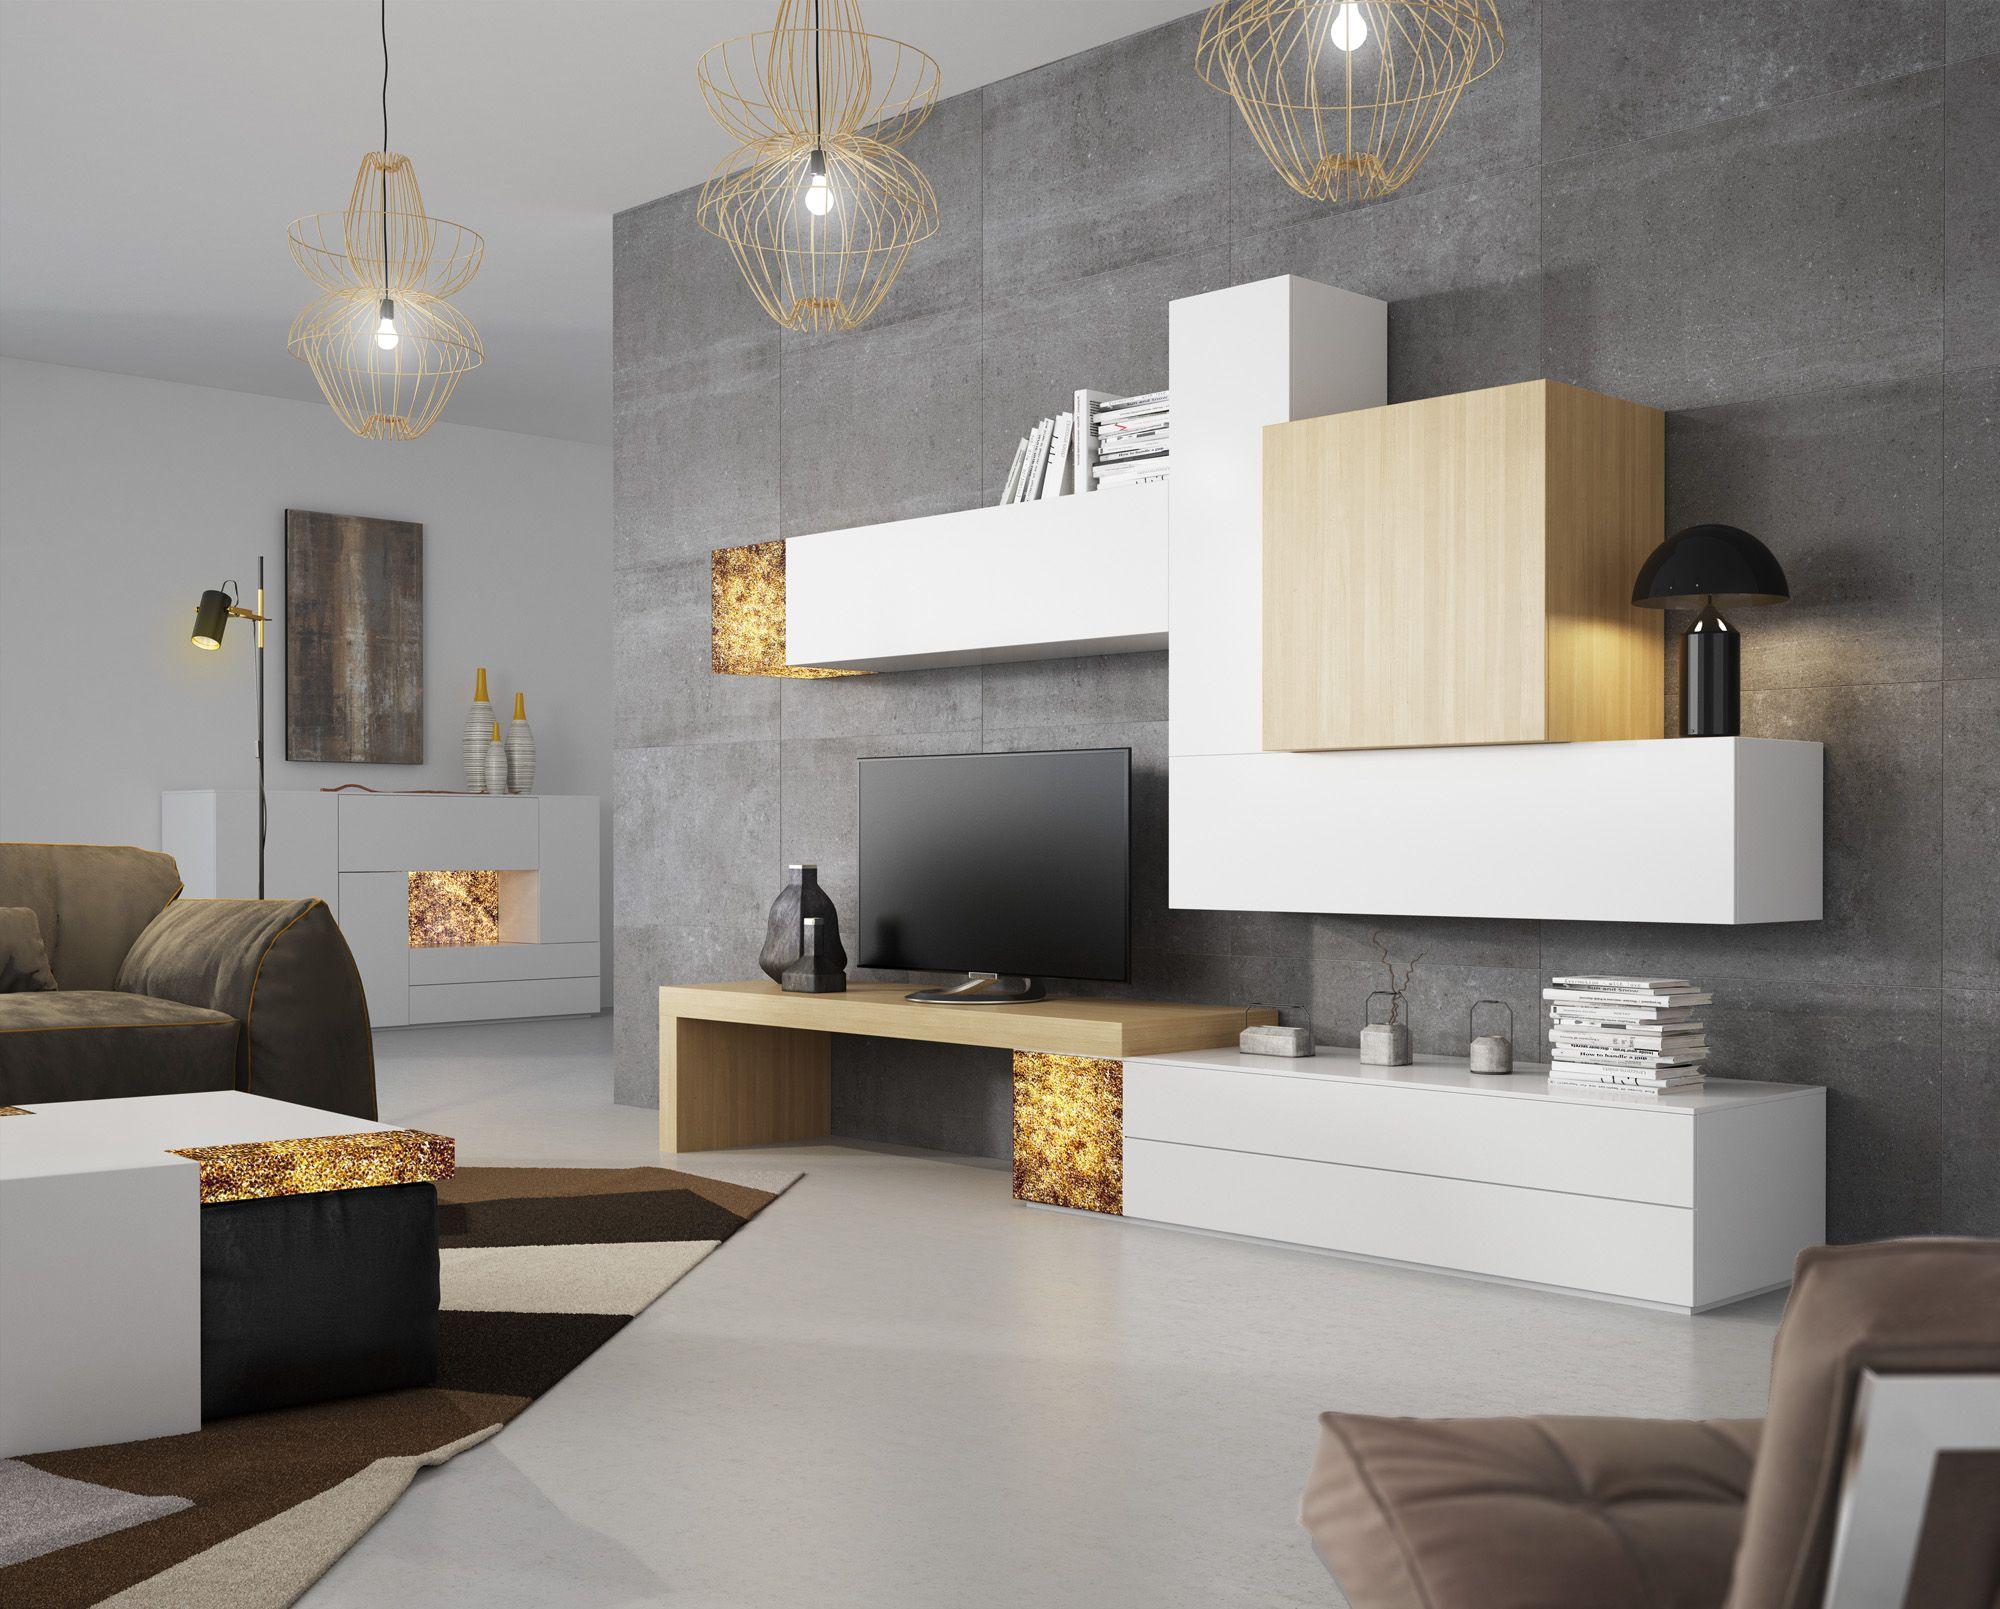 Colecci n ortus evolution comedores modernos muebles - Comedores diseno moderno ...